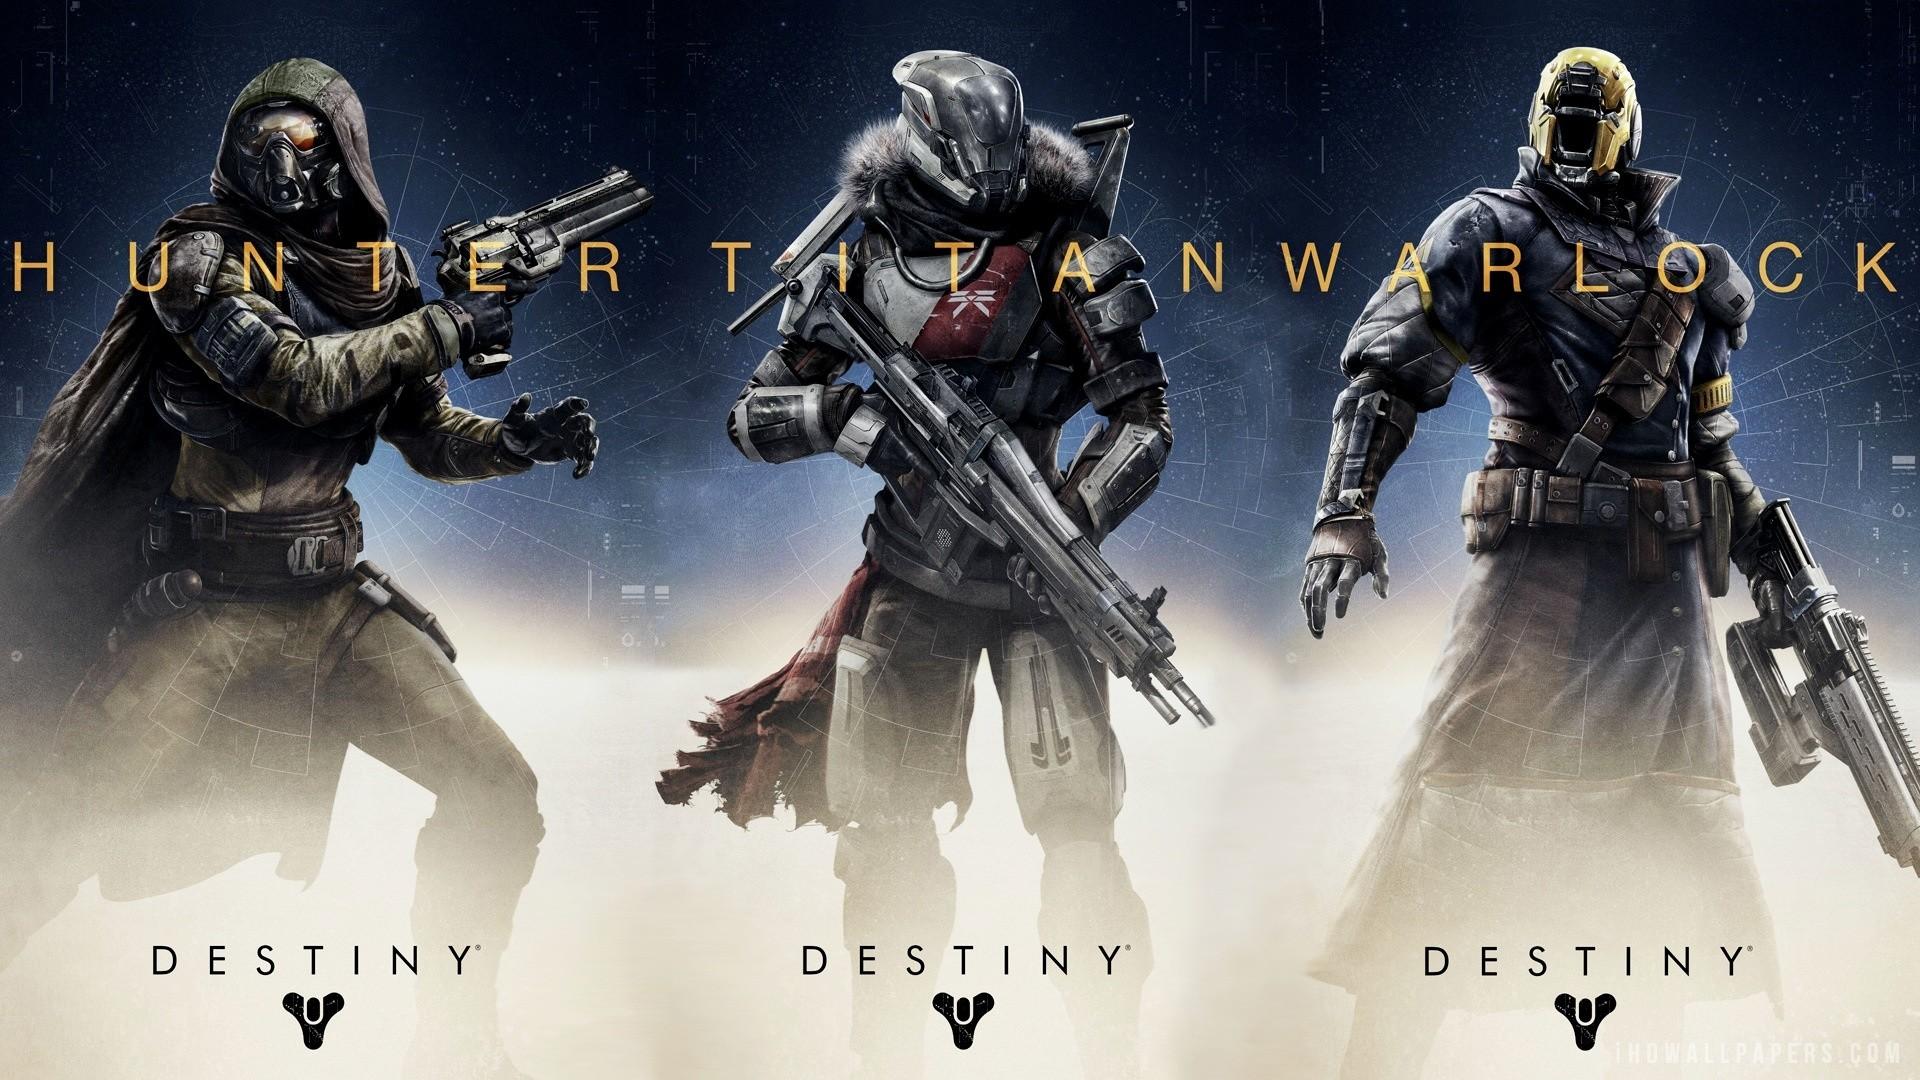 Destiny Game Wallpaper HD p